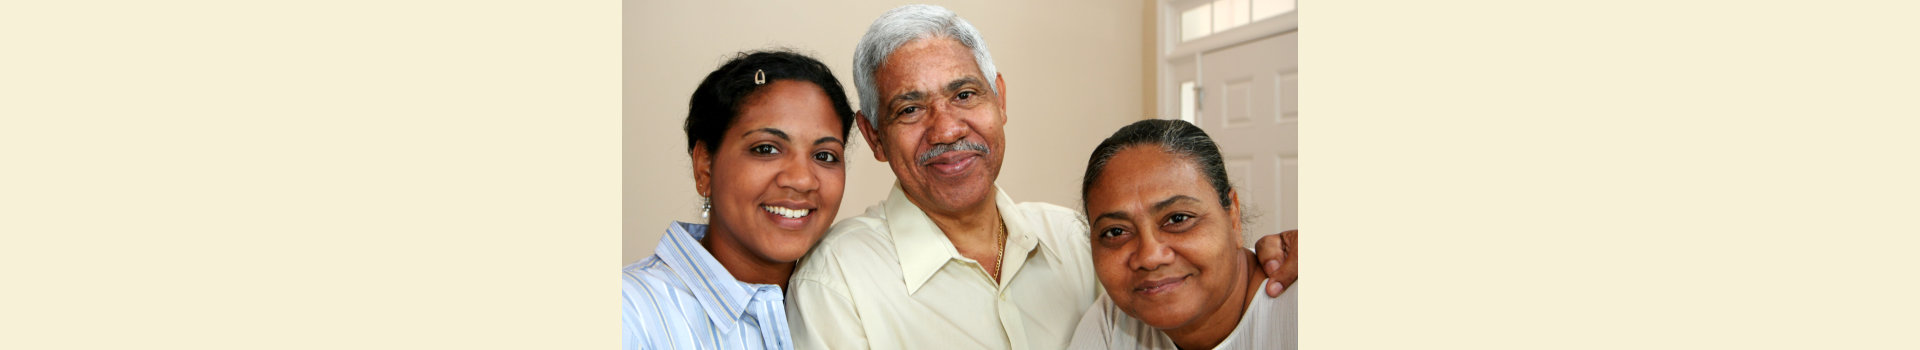 caregiver withe elders